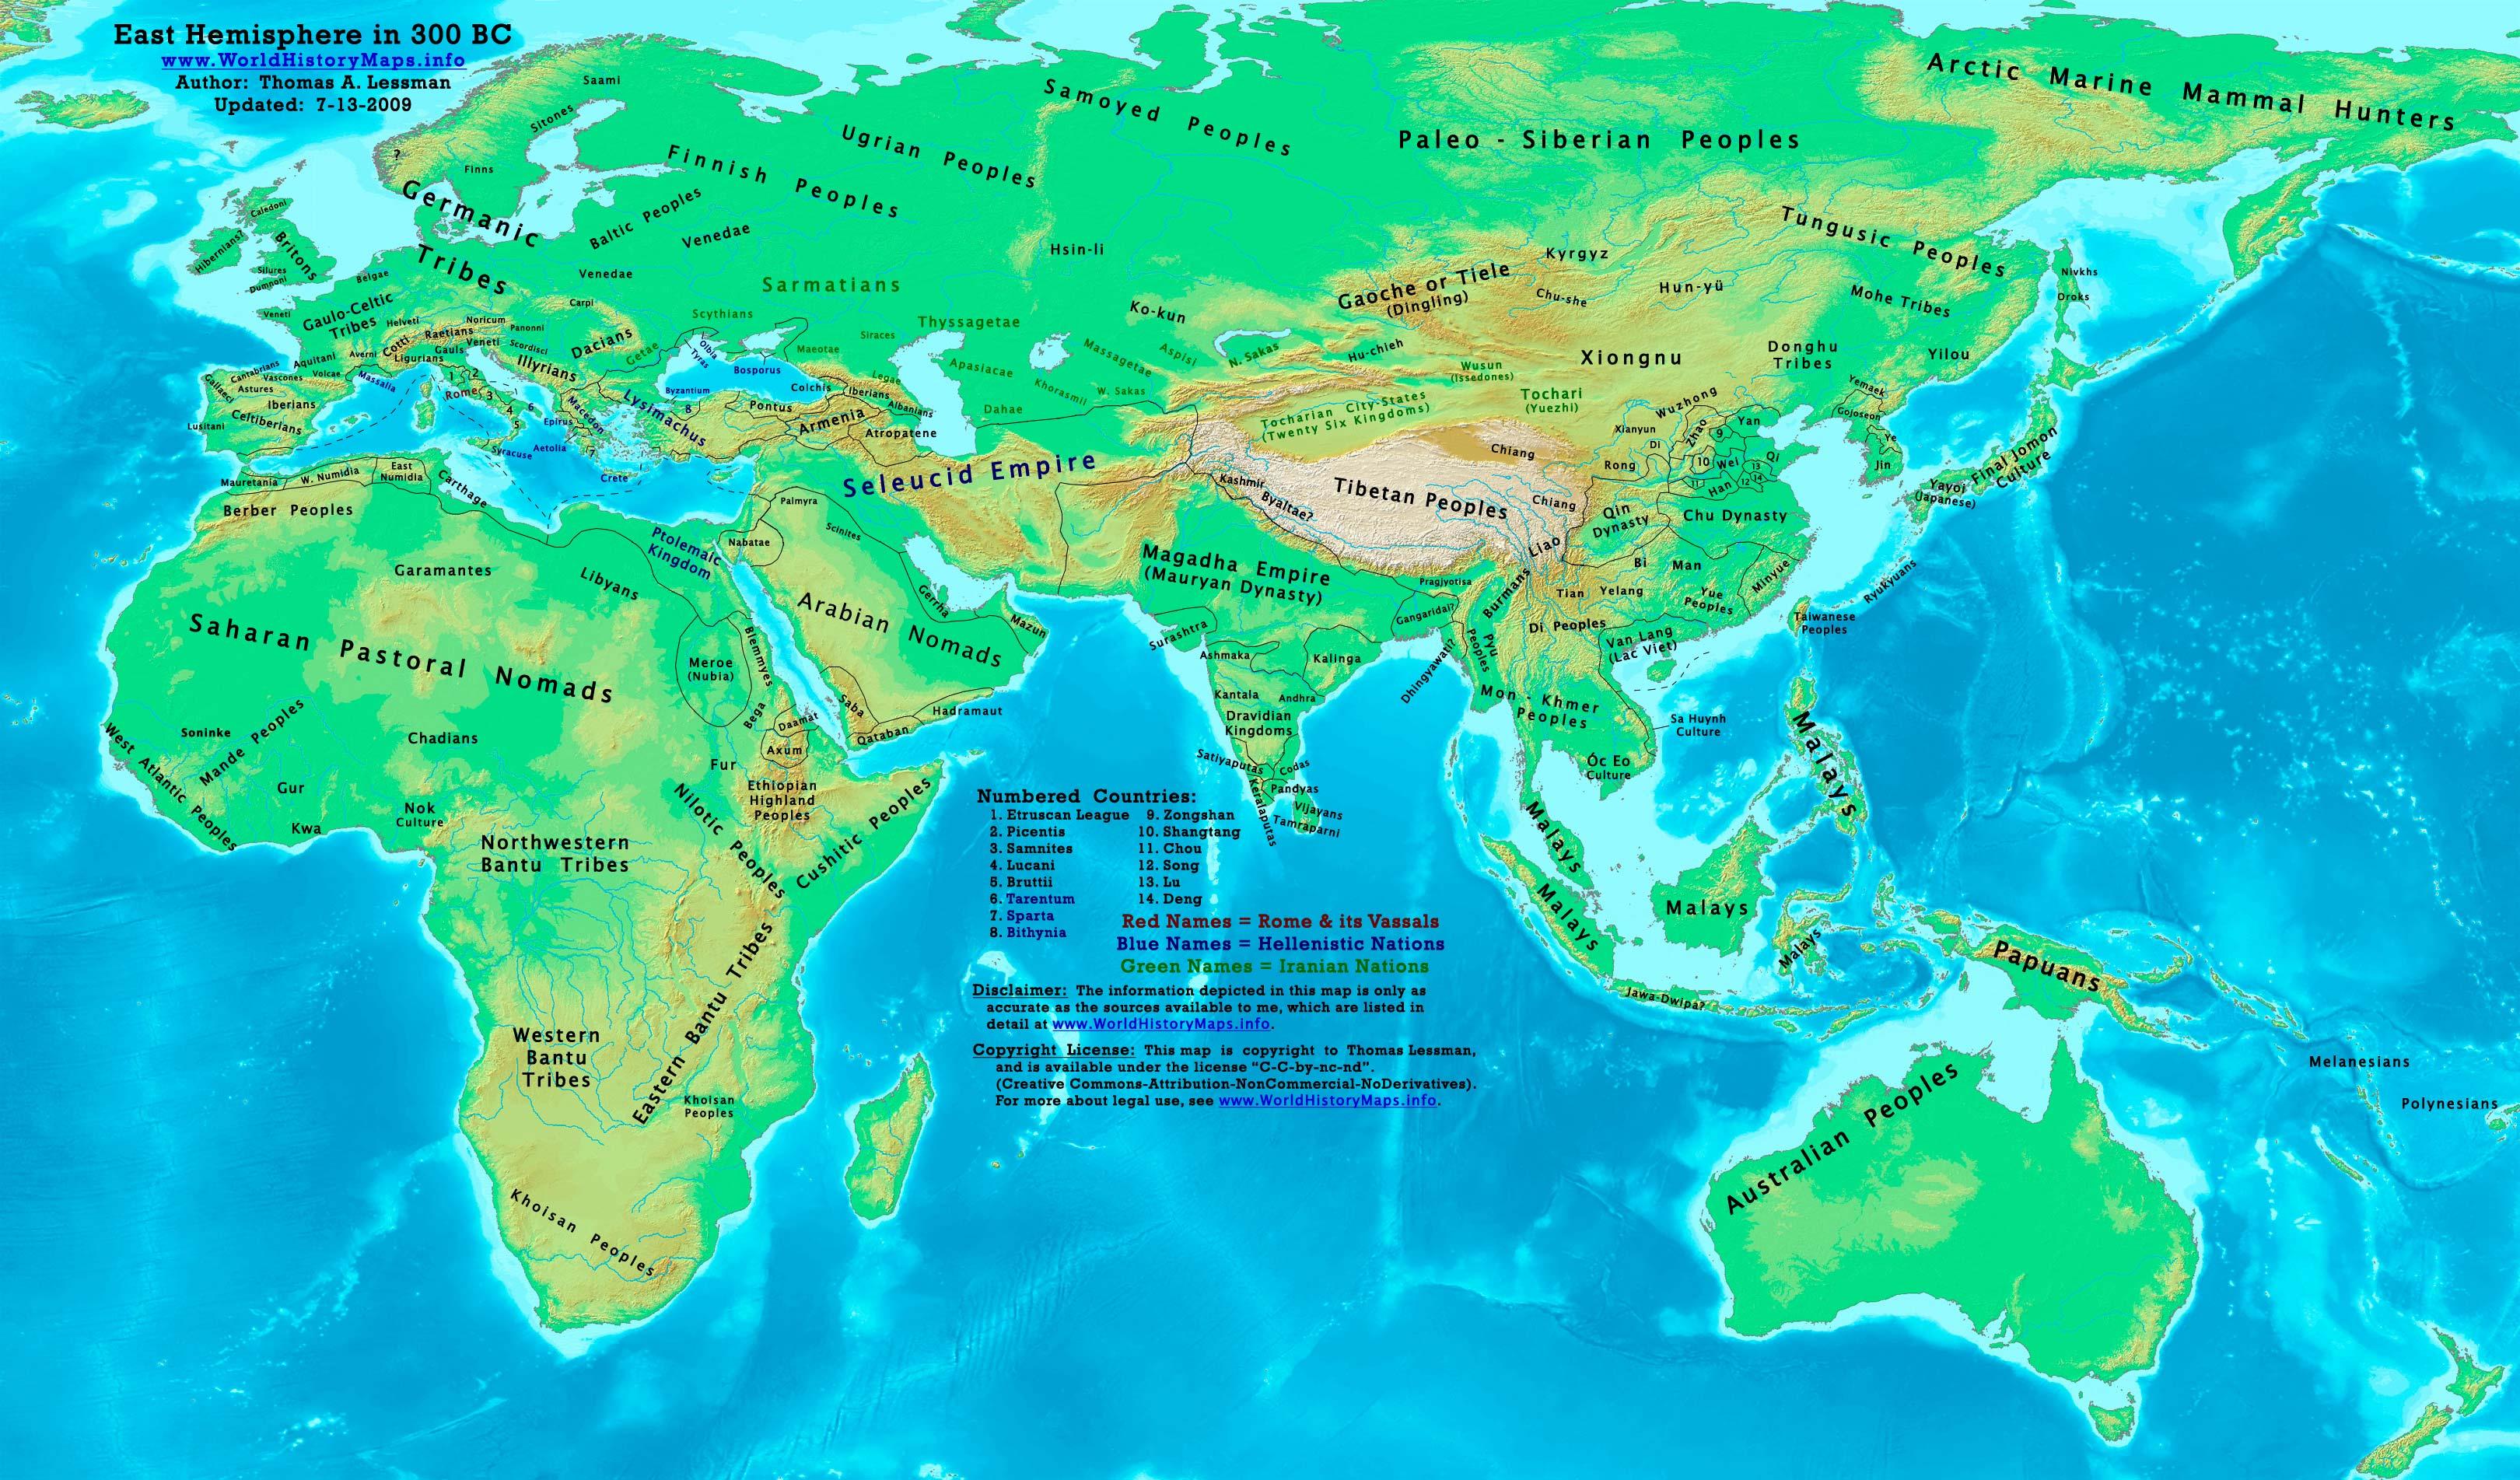 ancient world 300 BC